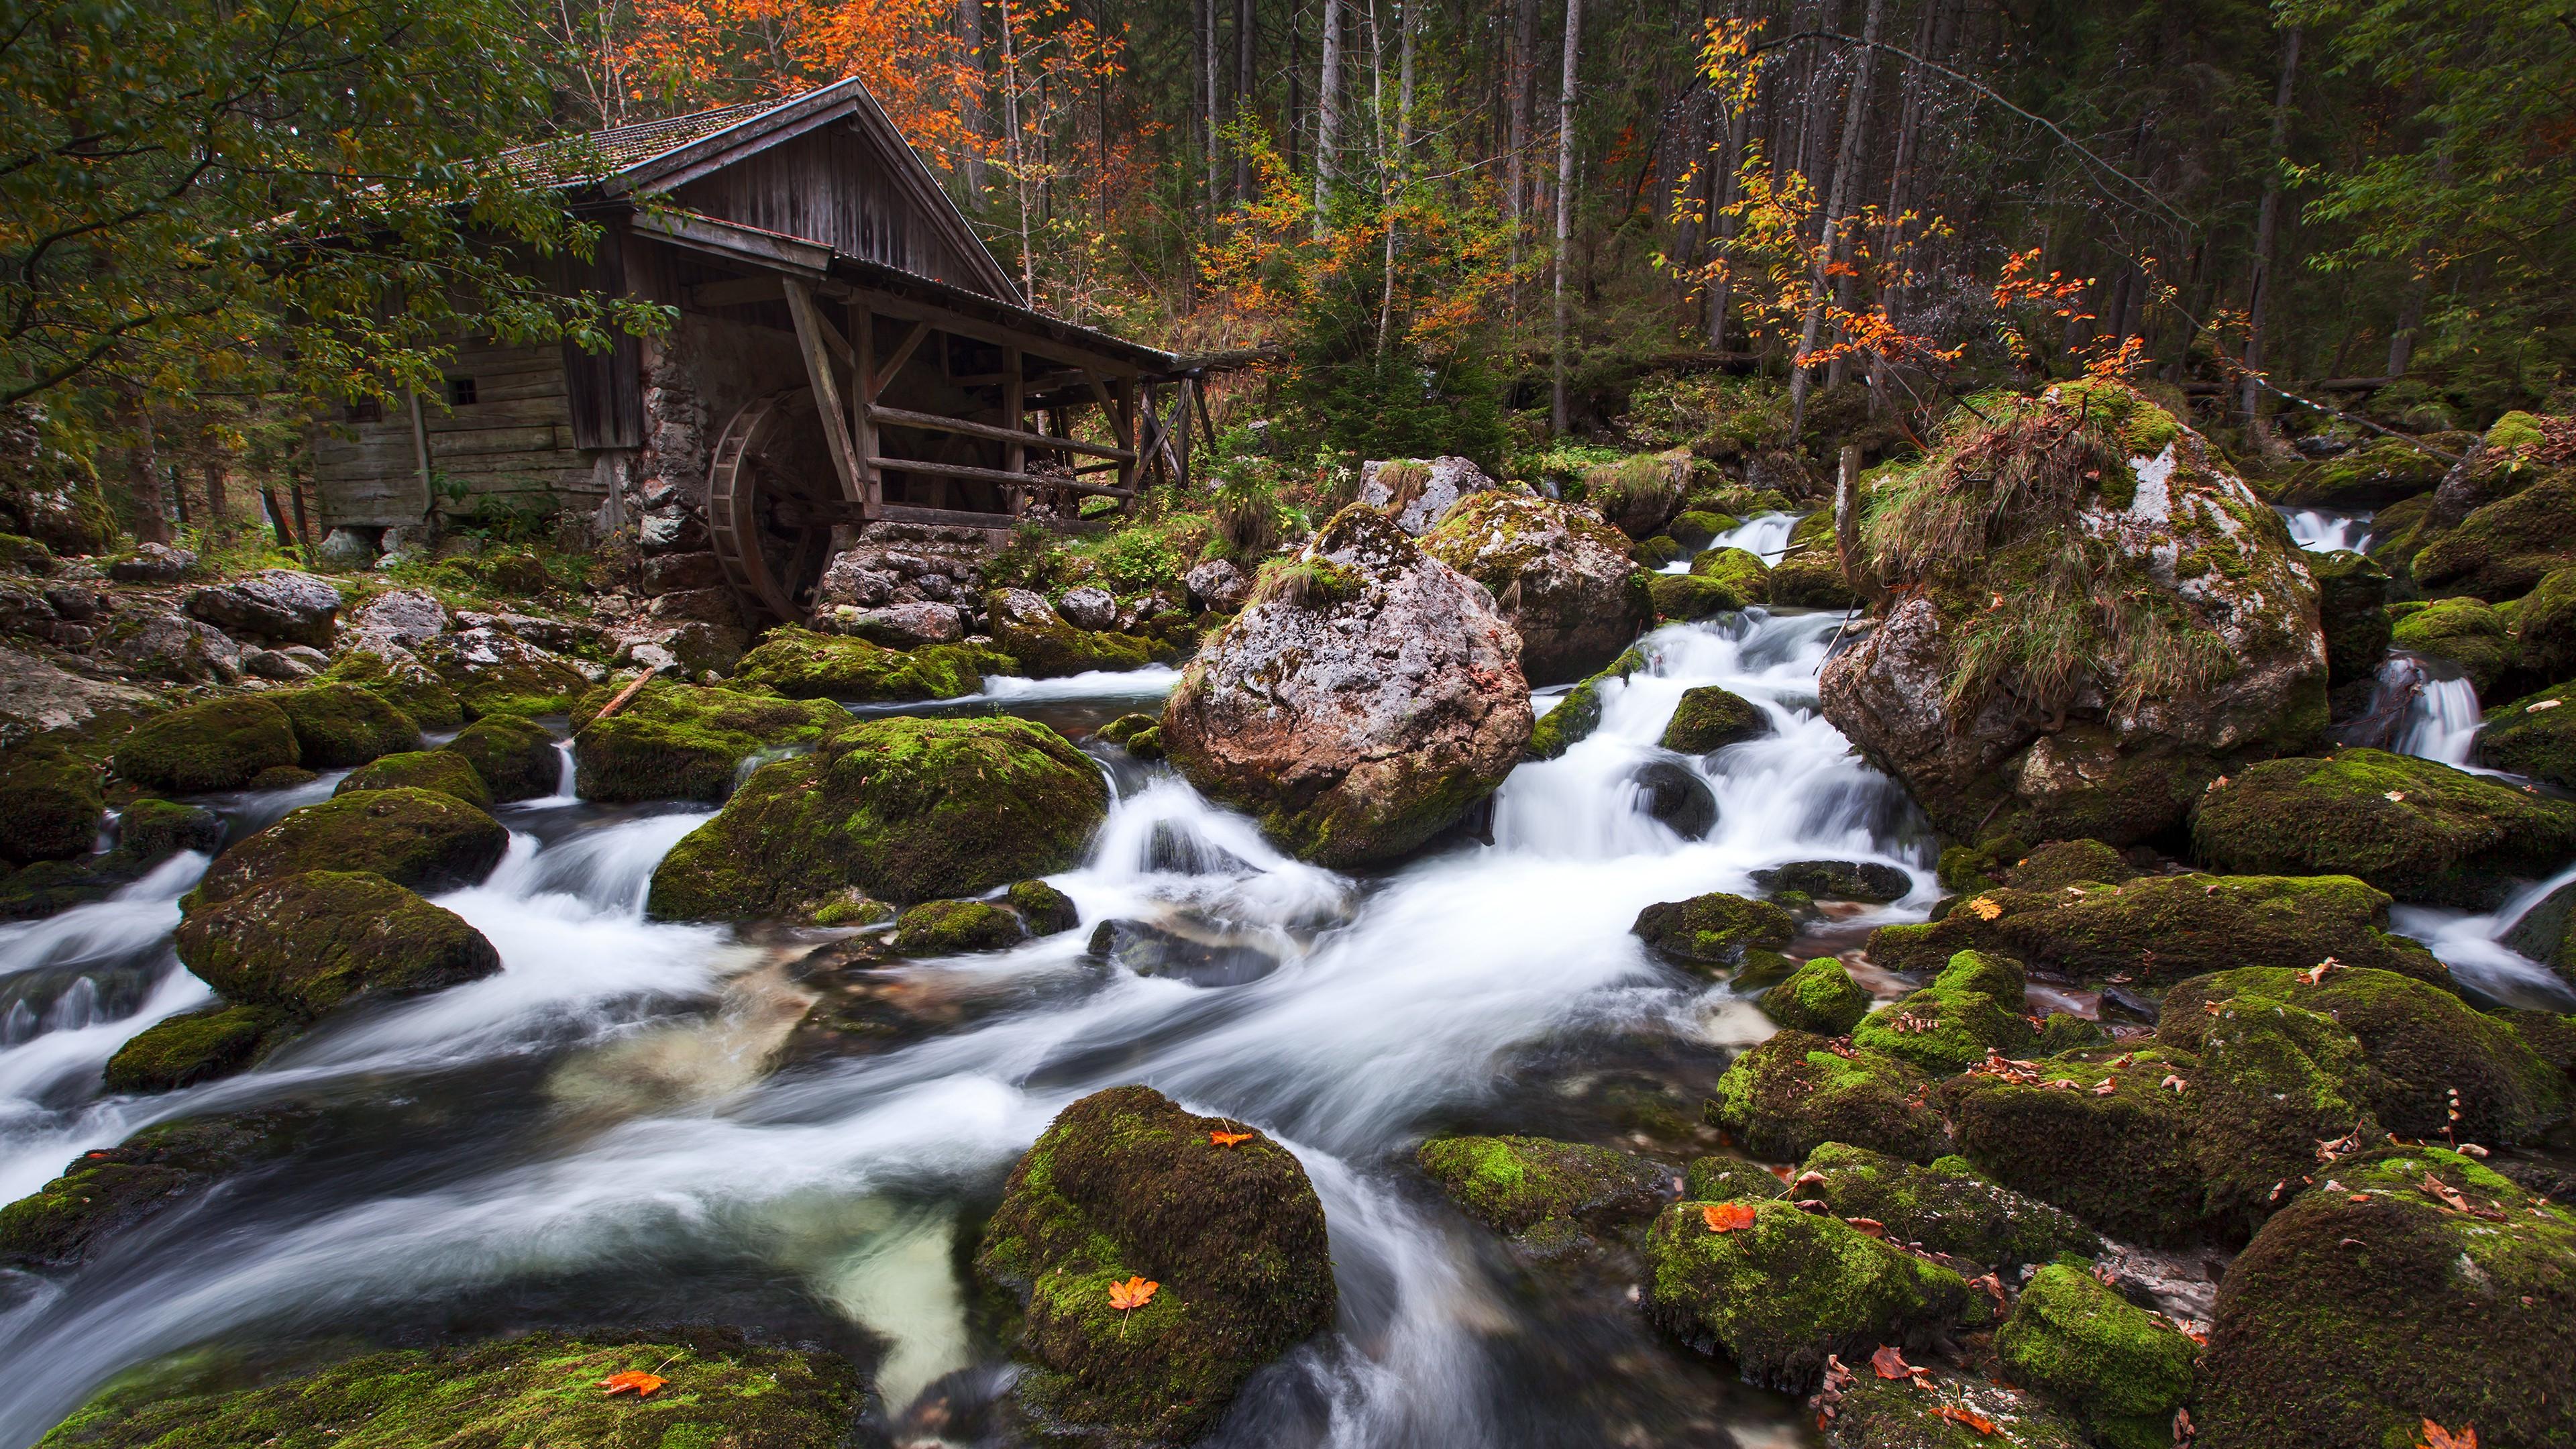 Wallpaper Landscape Forest Waterfall Rock Nature